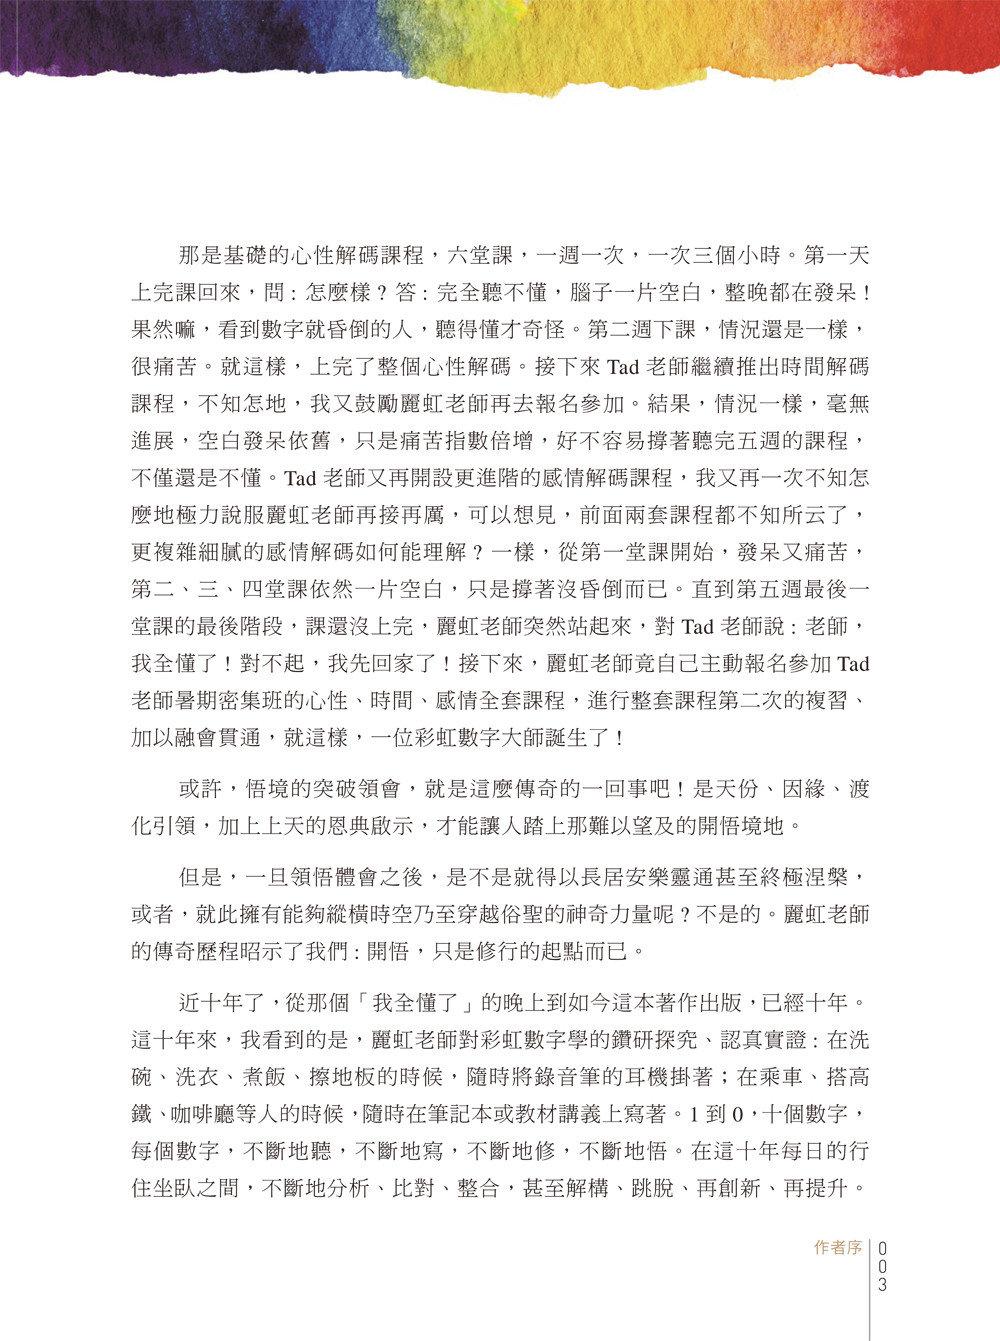 麗子の彩虹數字學:數字解碼與理論基礎-preview-3